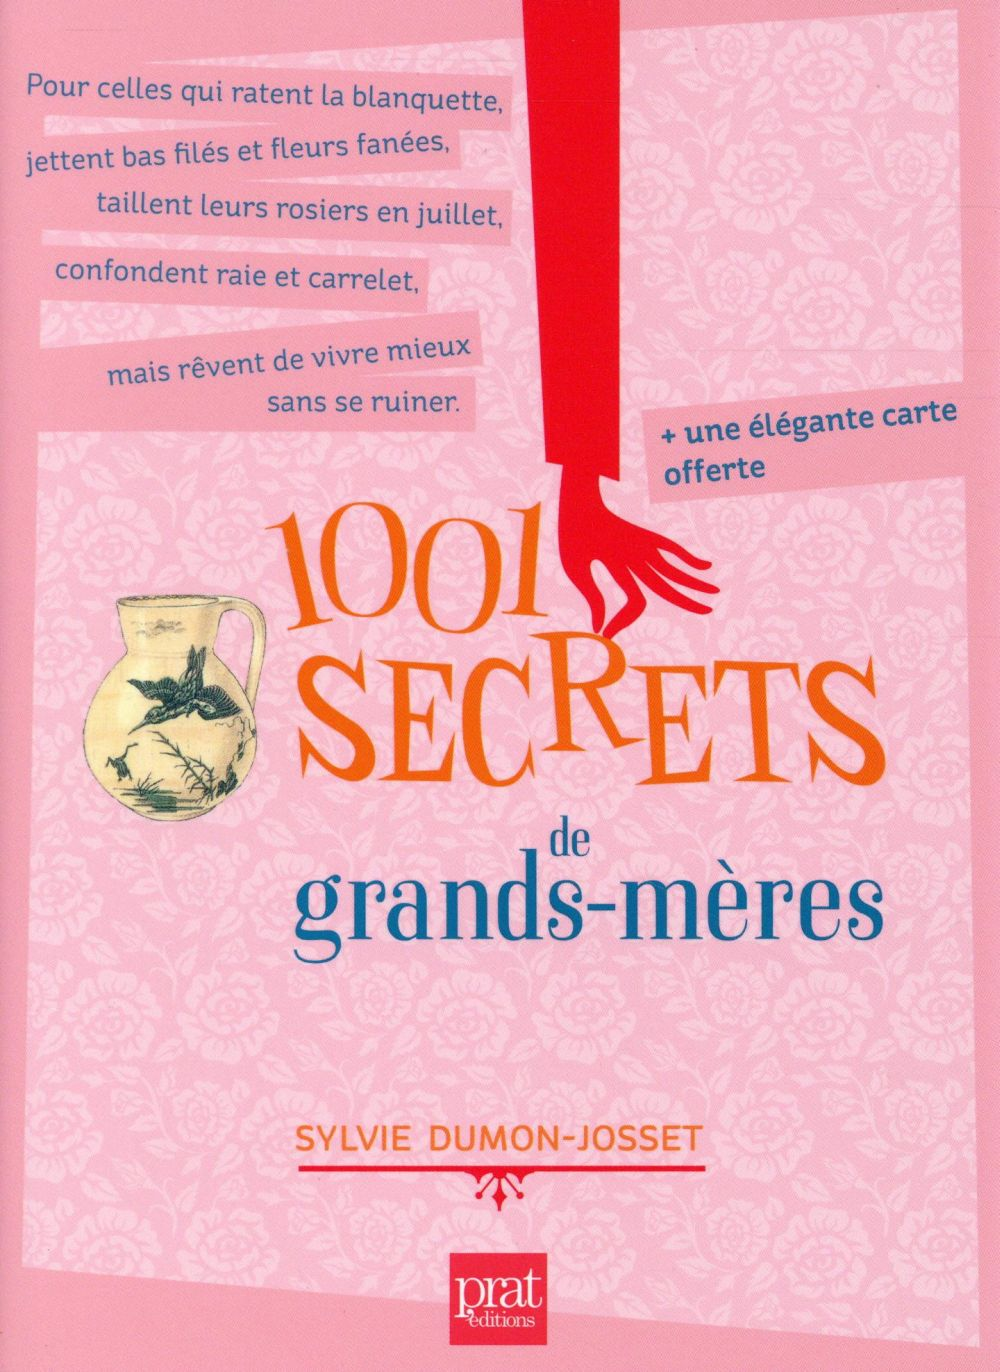 1001 SECRETS DE GRANDS MERES NED DUMON JOSSET SYLVIE Prat